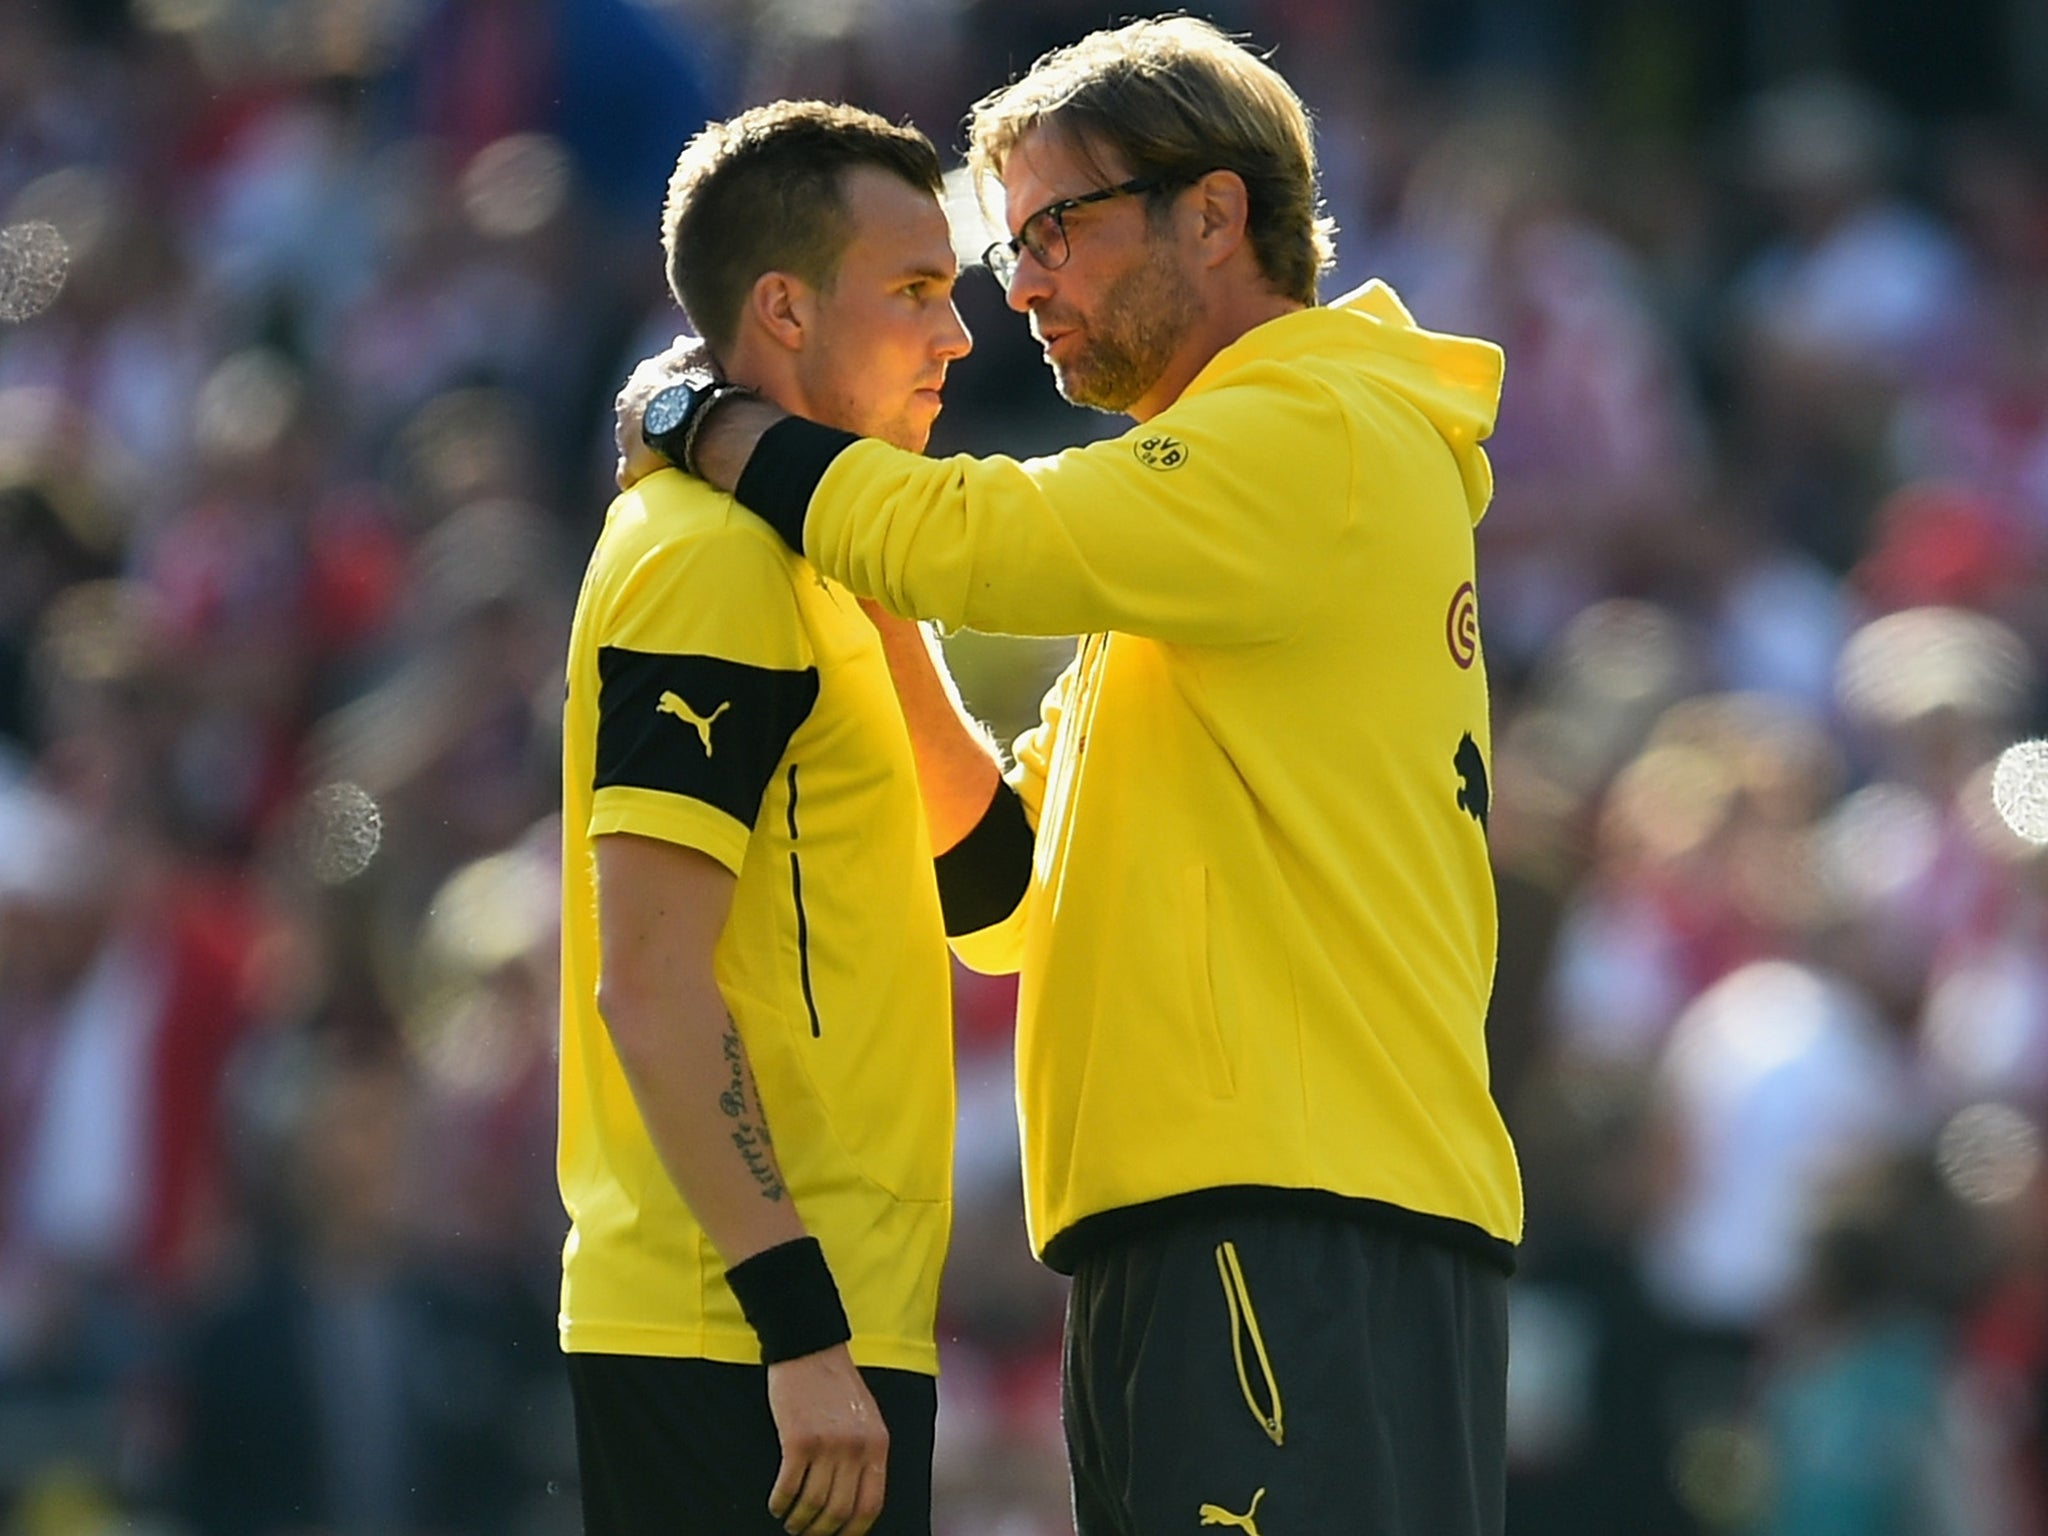 Real Madrid vs Dortmund live stream: Watch online, TV, time